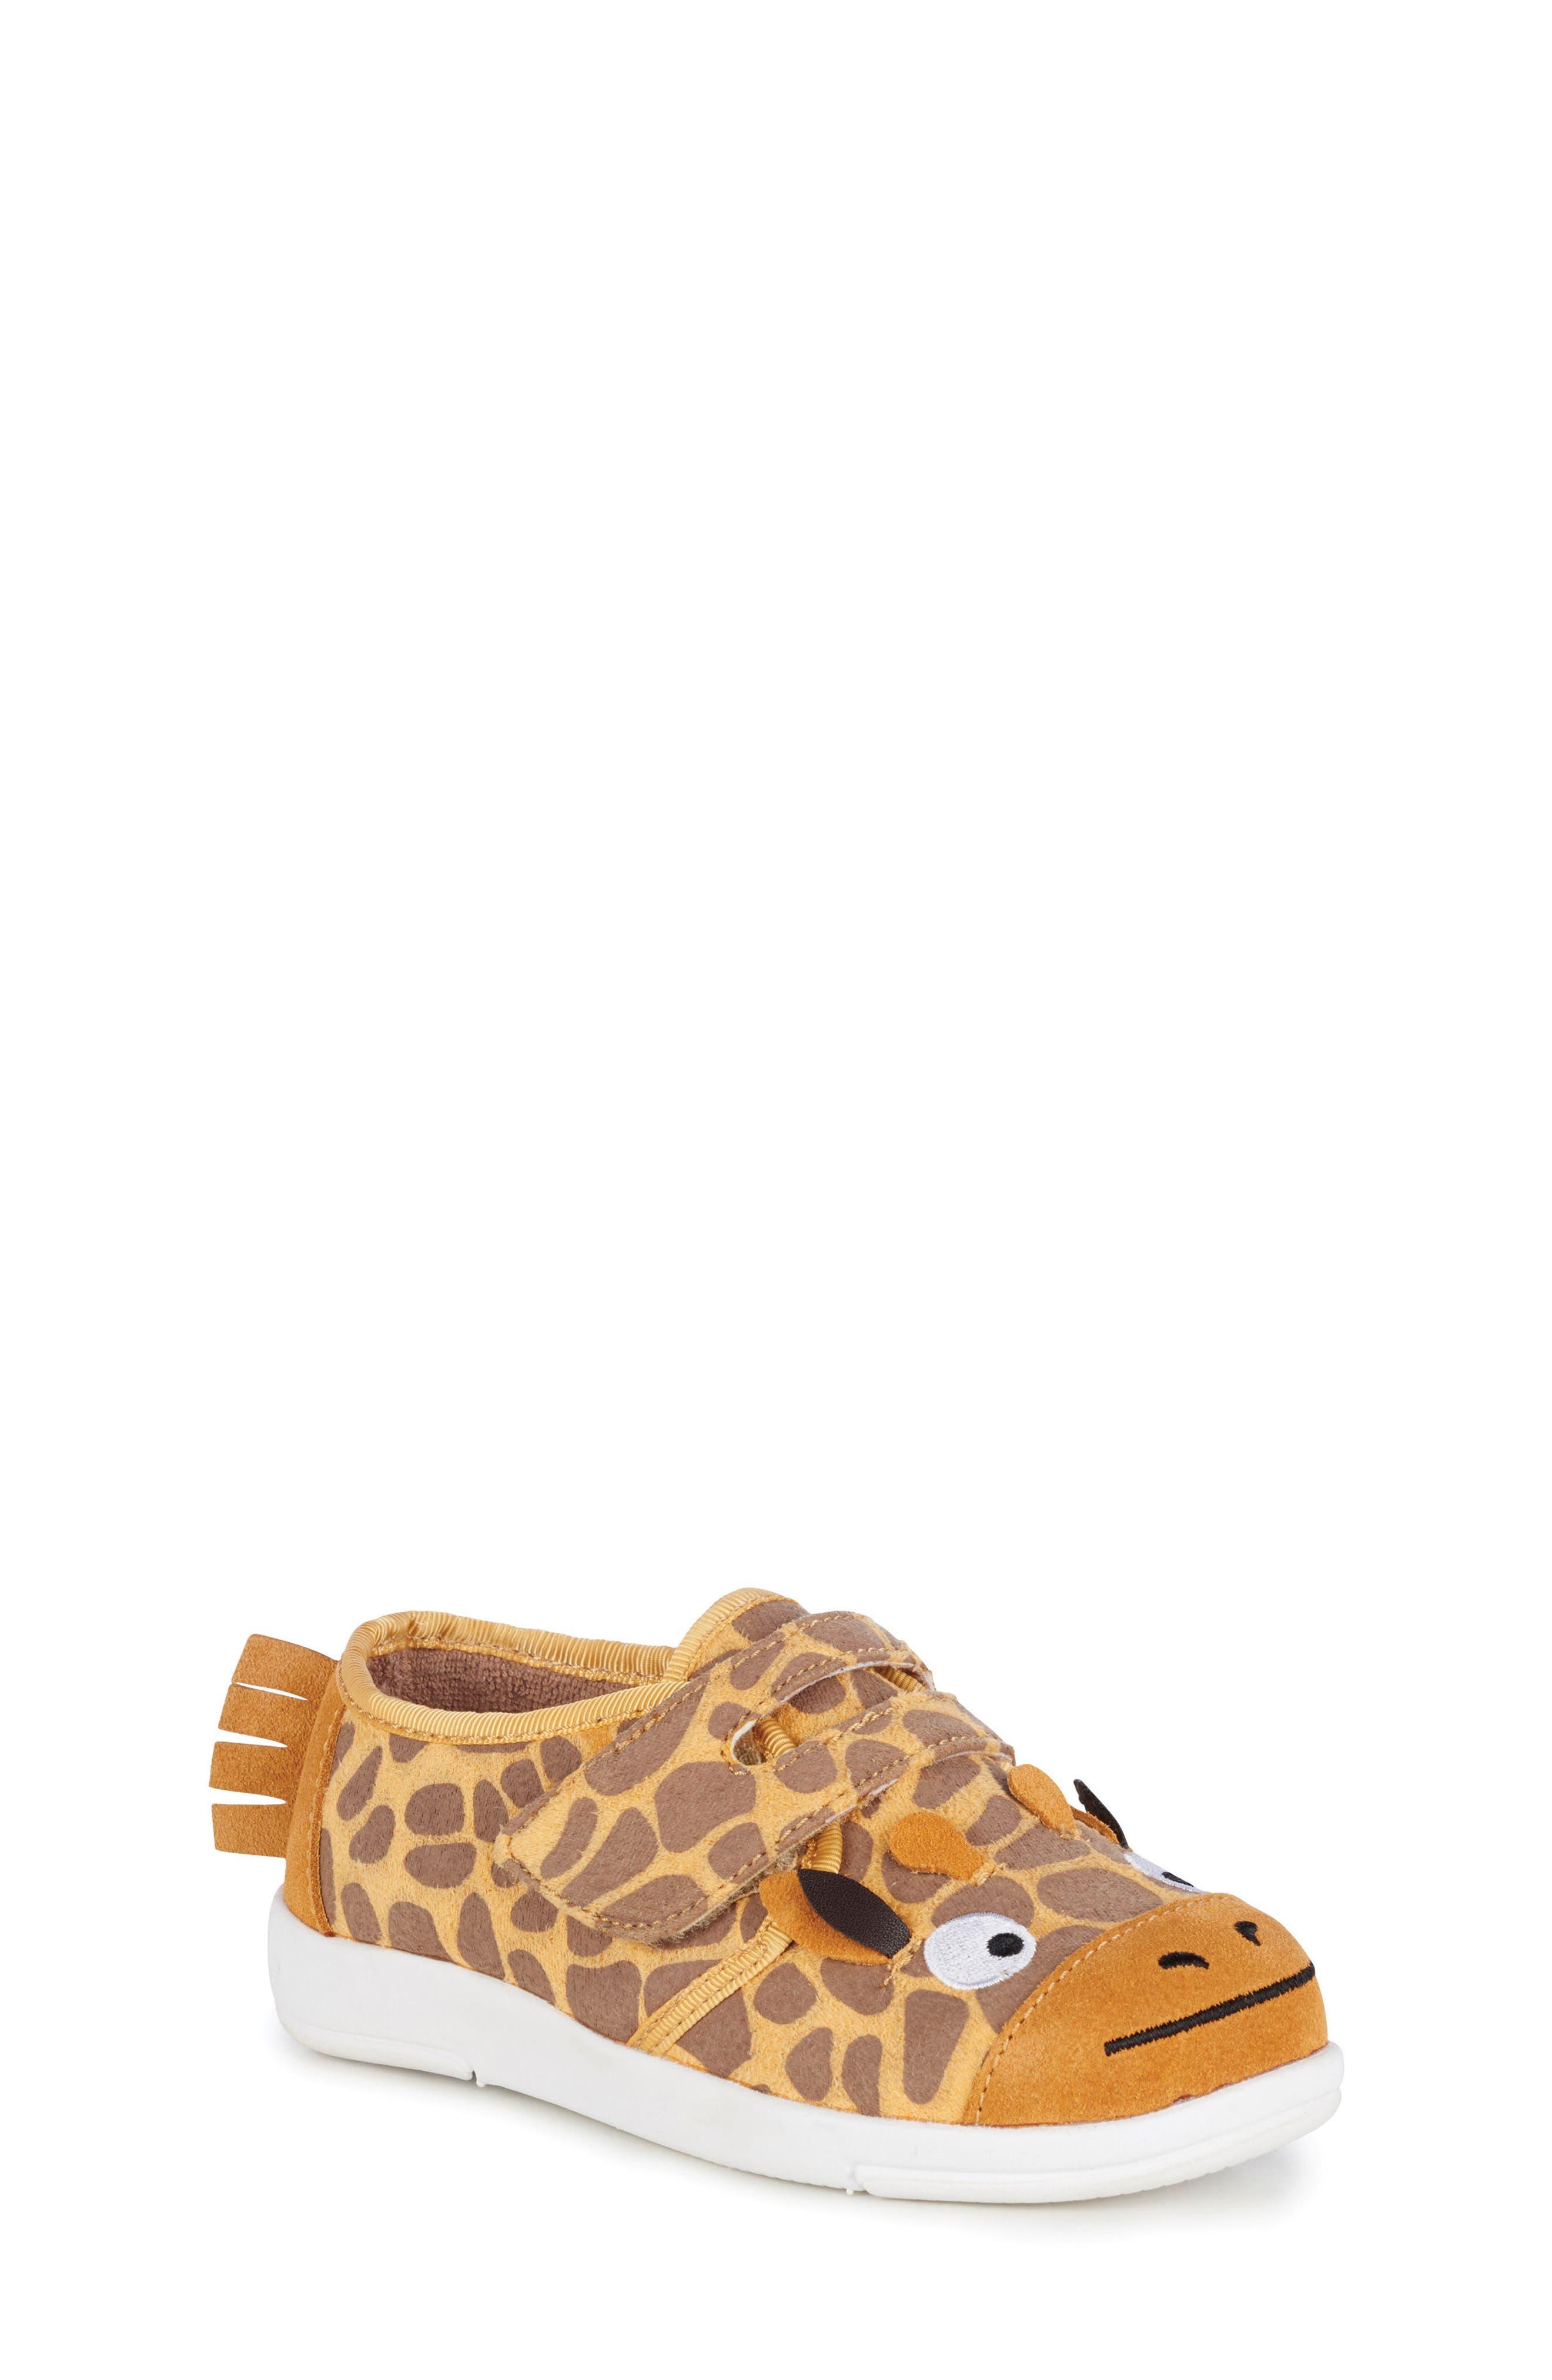 Giraffe Sneaker,                             Main thumbnail 1, color,                             Yellow